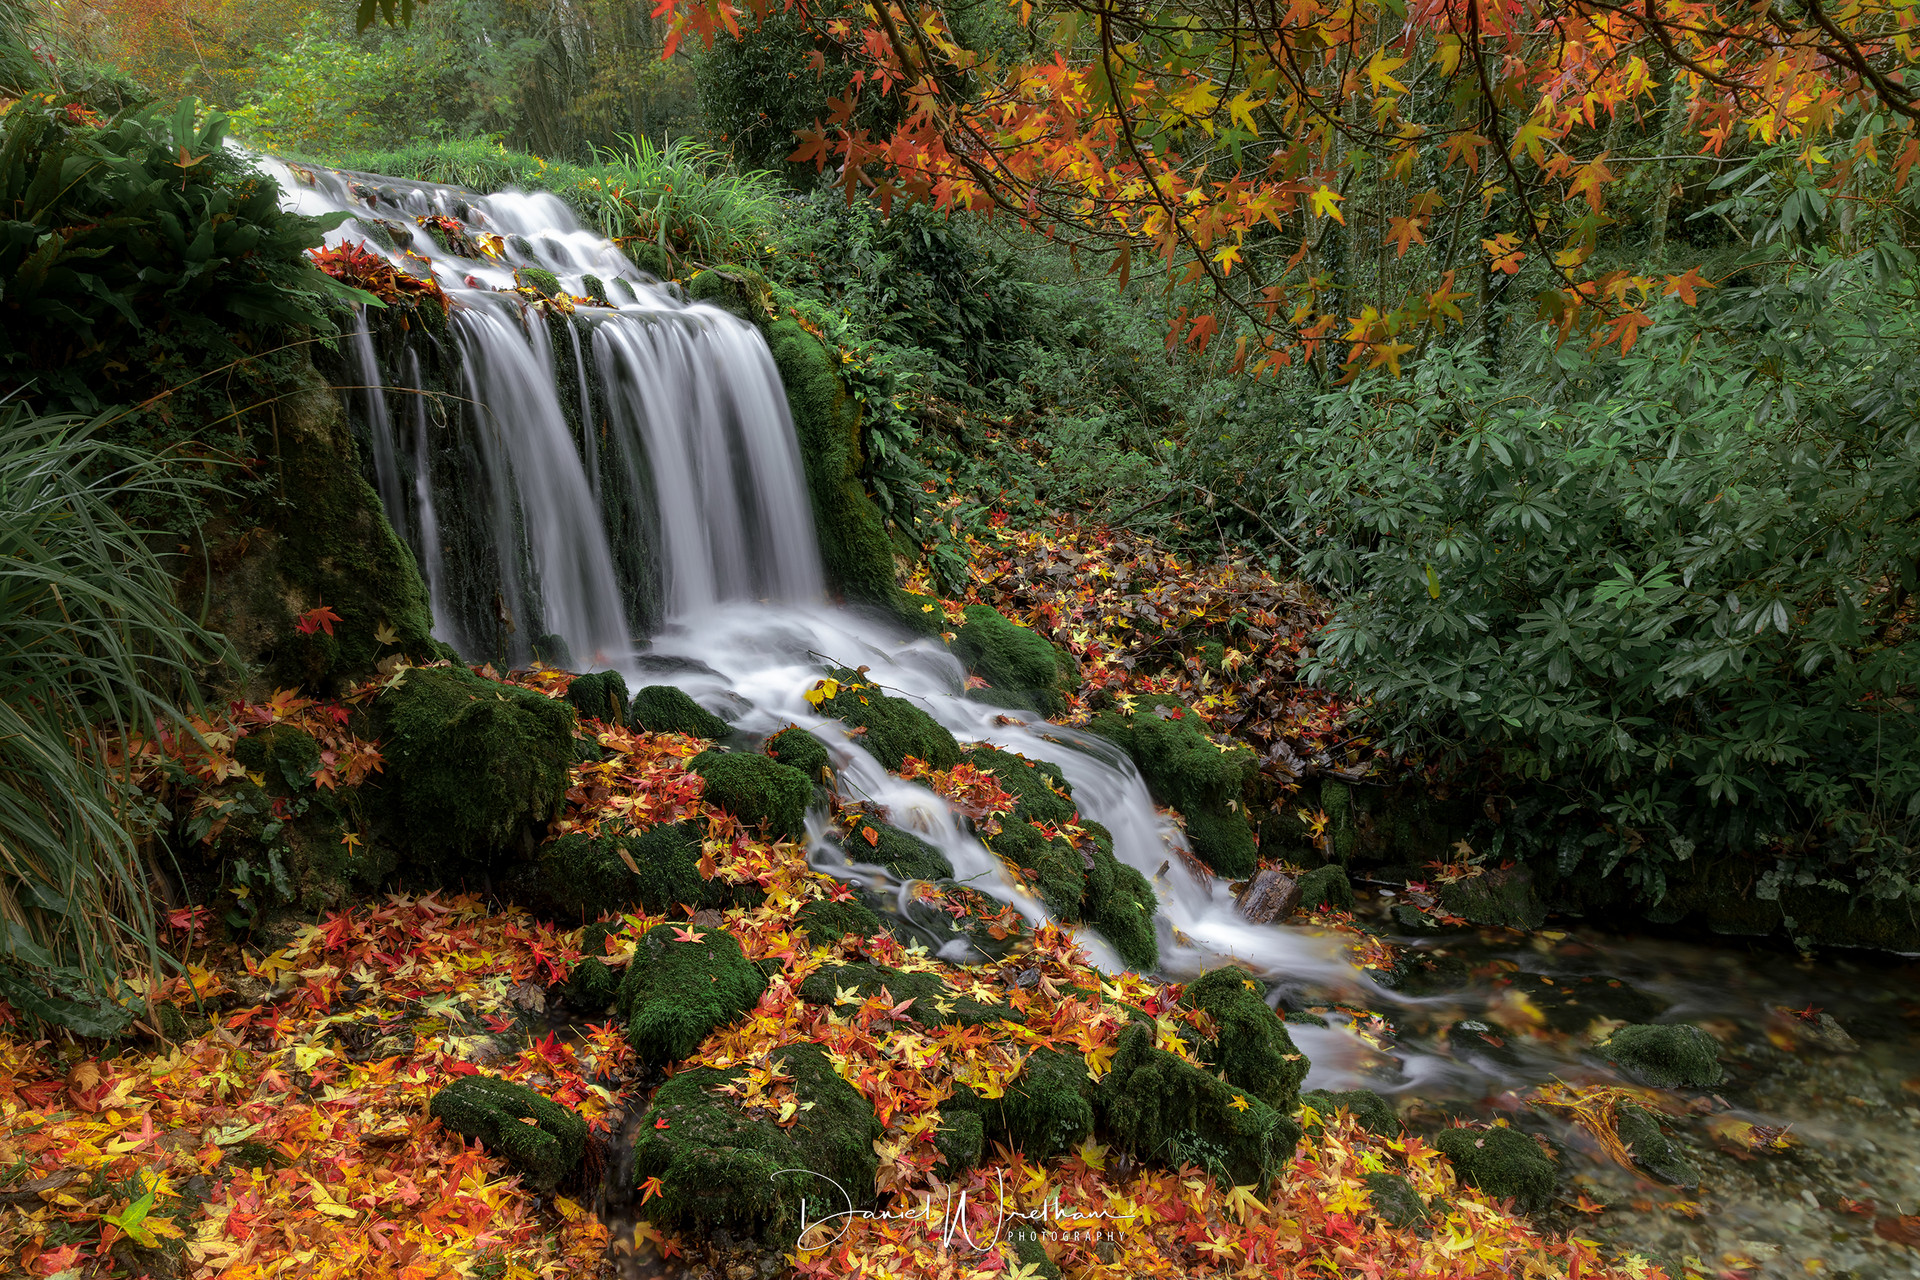 Littlebredy Waterfall